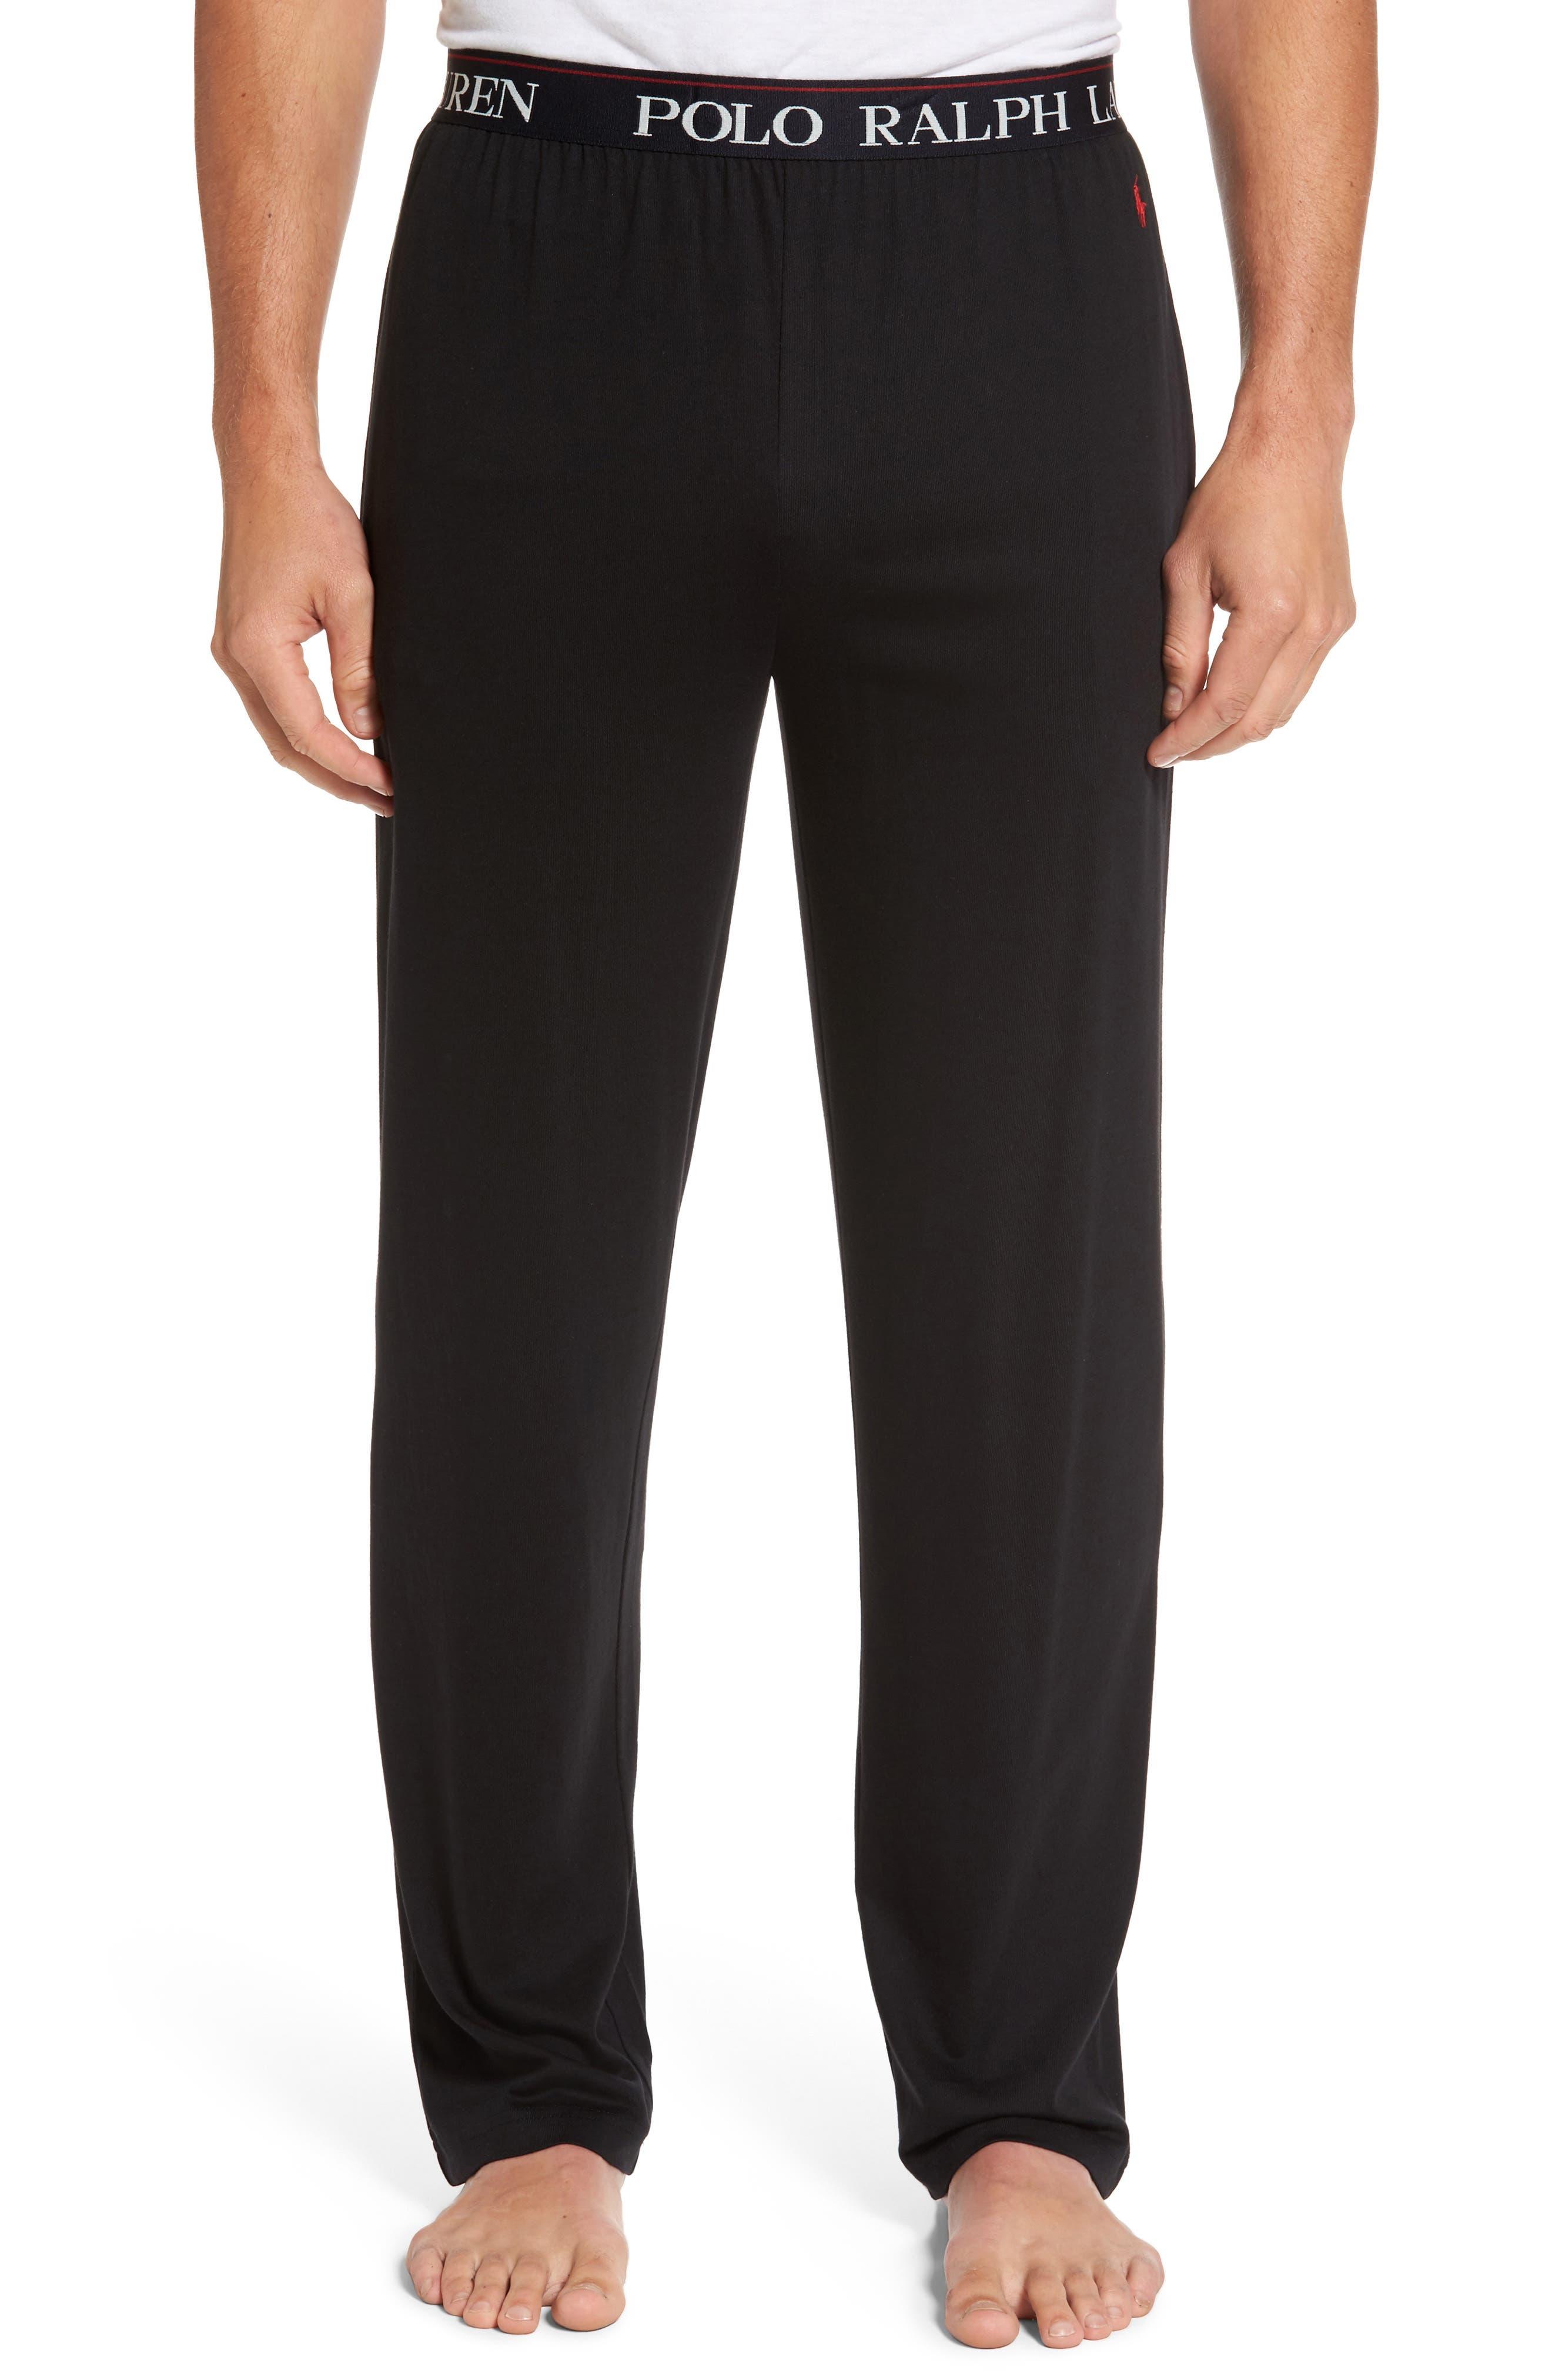 POLO RALPH LAUREN Cotton & Modal Lounge Pants, Main, color, POLO BLACK